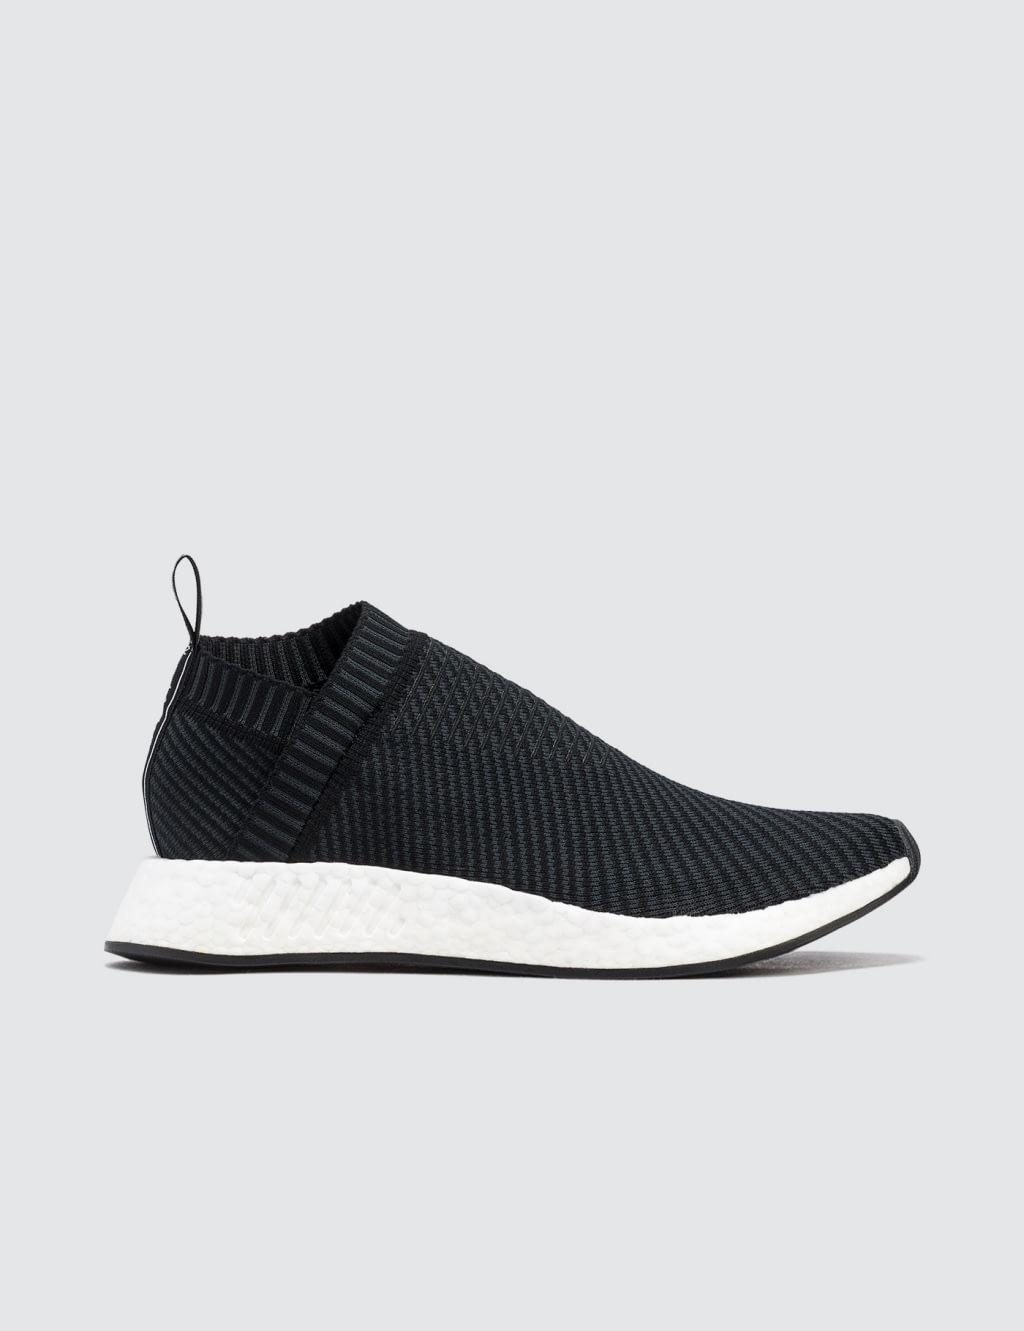 comprare originali adidas originali nmd cs2 sock 2 primeknit in città